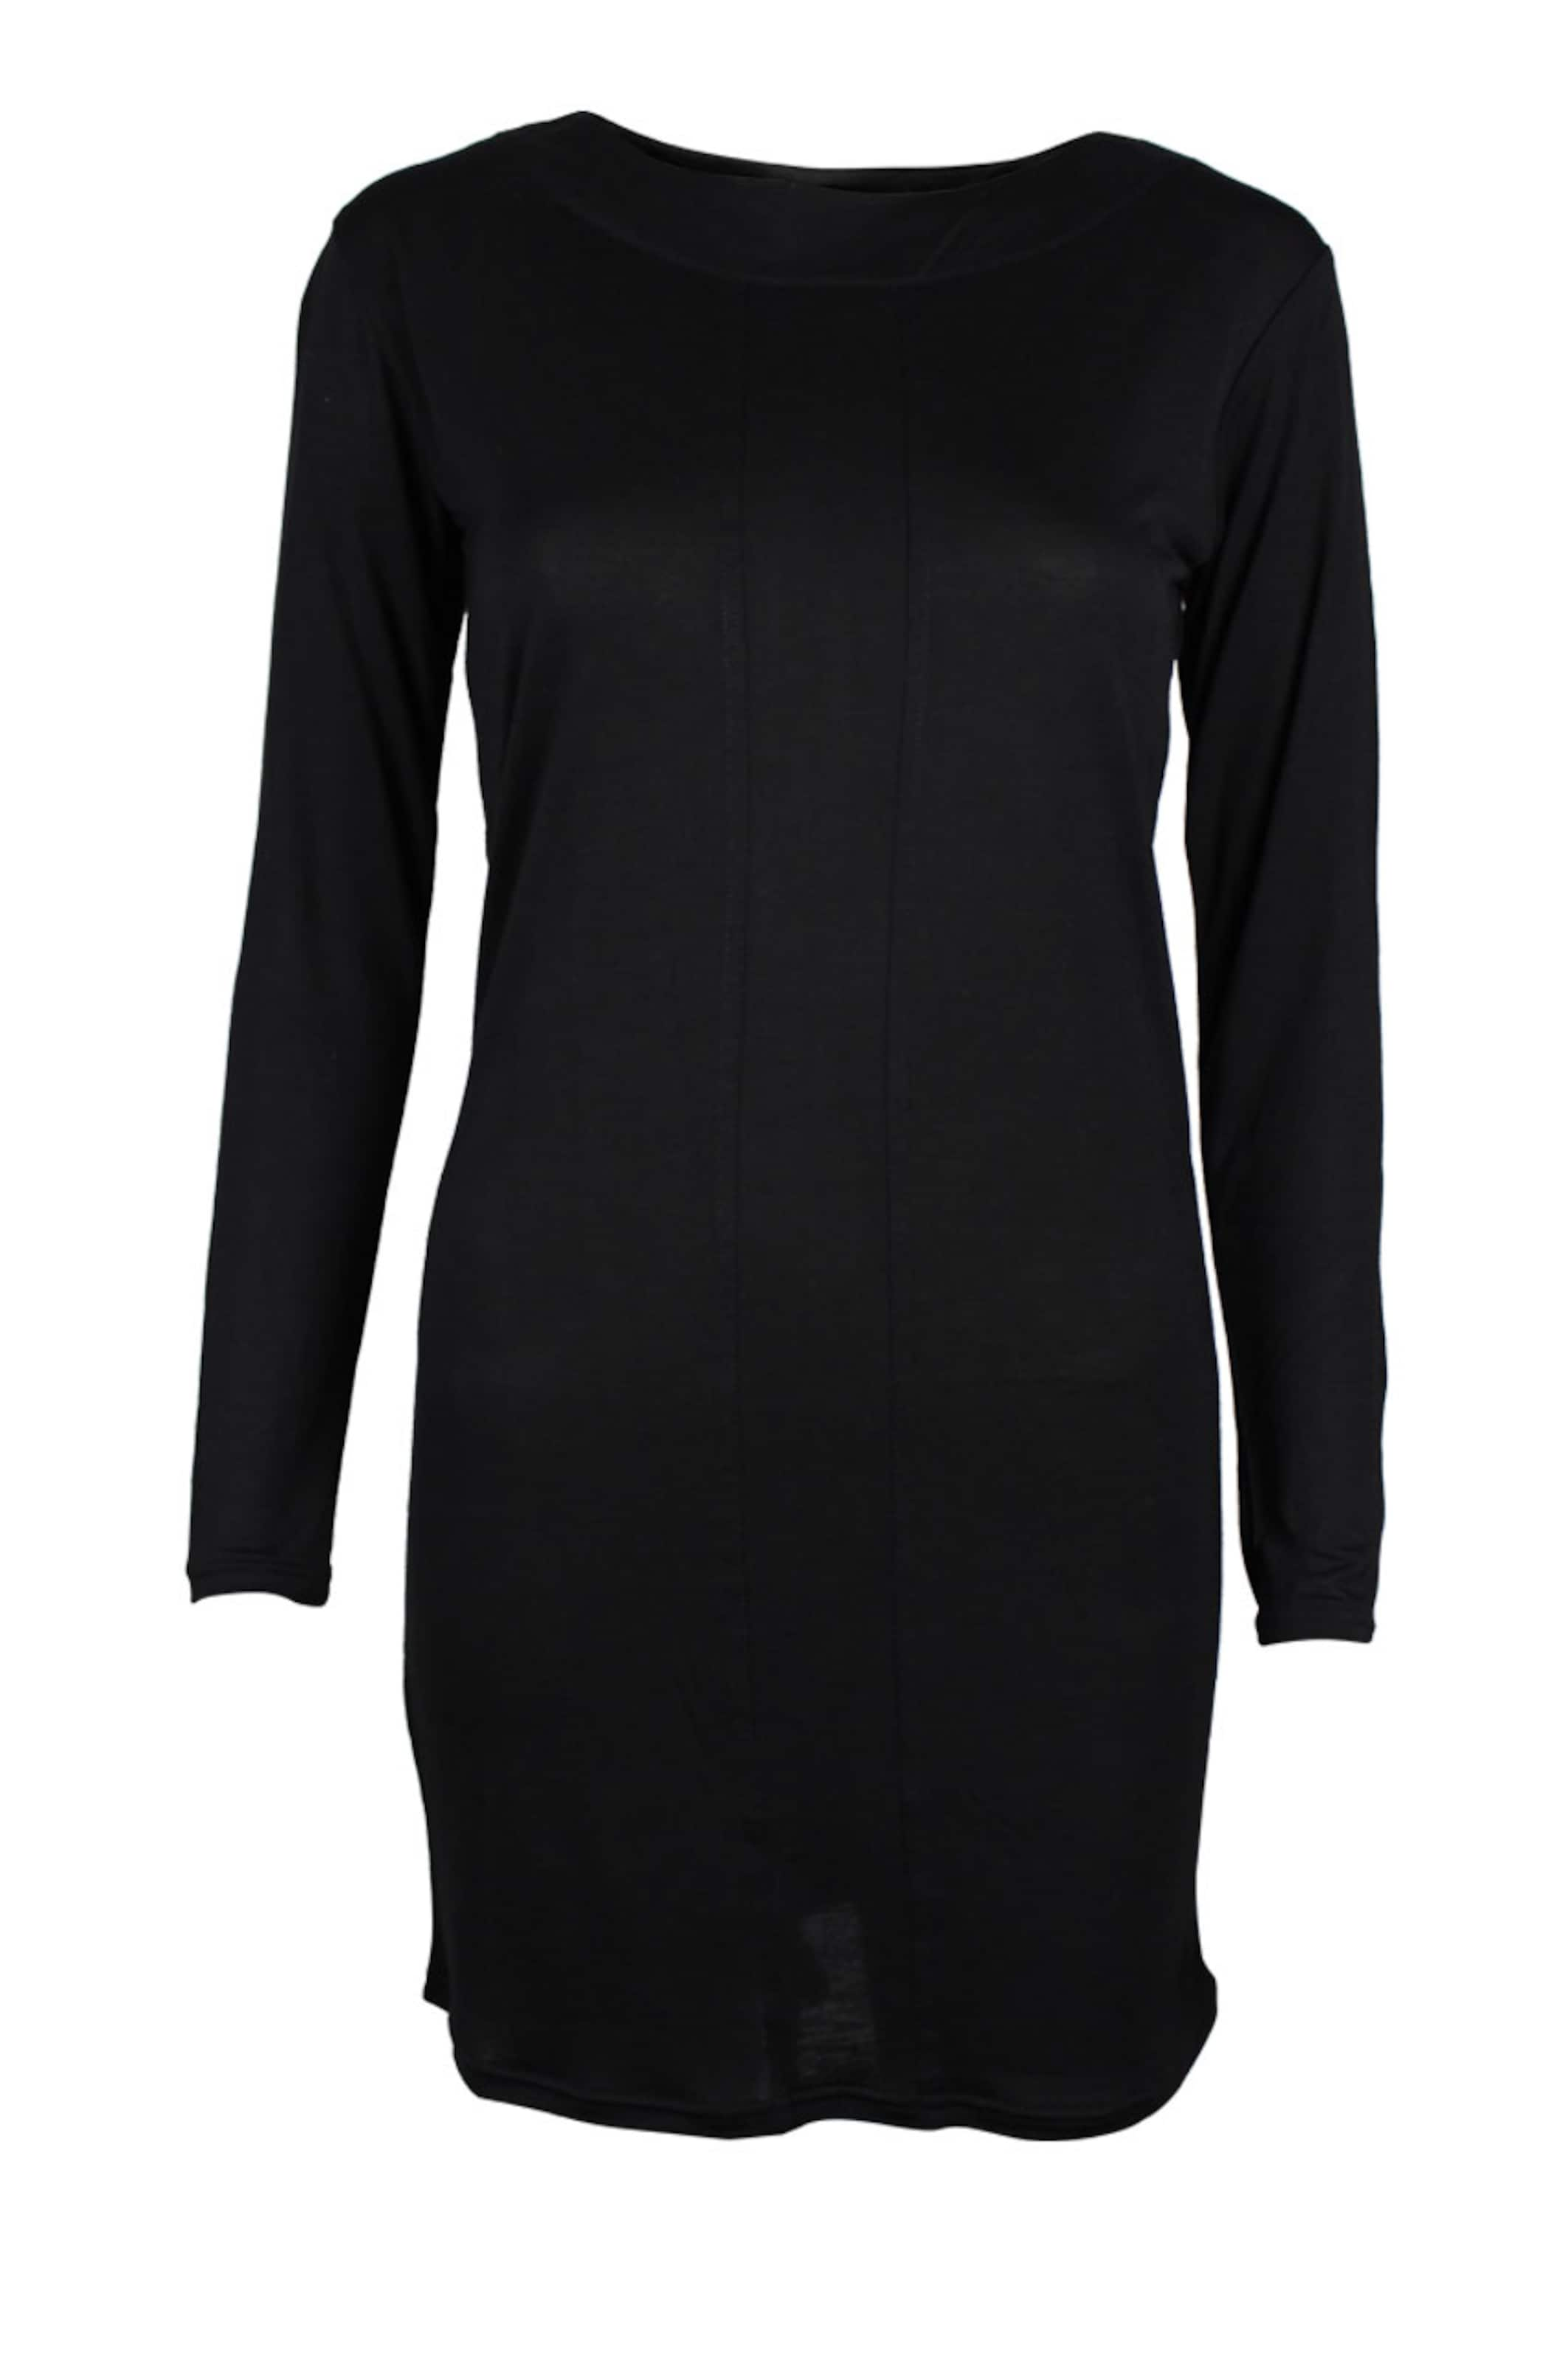 Schwarz Kleid In Kleid In Trueprodigy Trueprodigy Trueprodigy Kleid Schwarz TZulOwPkXi